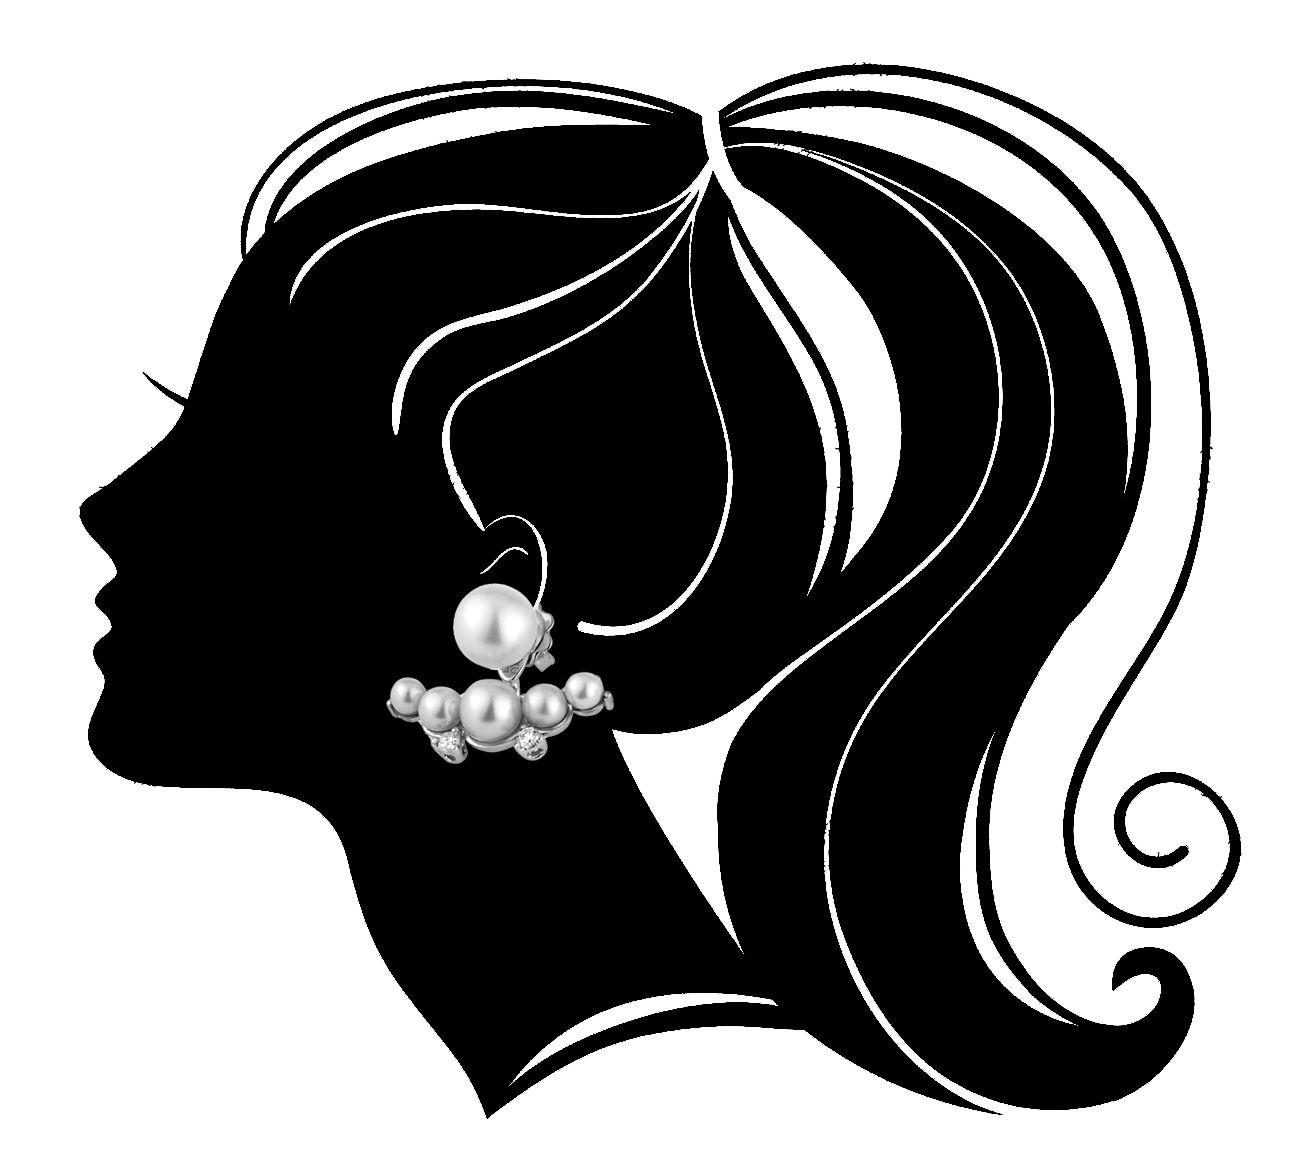 Refresh yourself with Utopia Aqua earrings. Wear it as